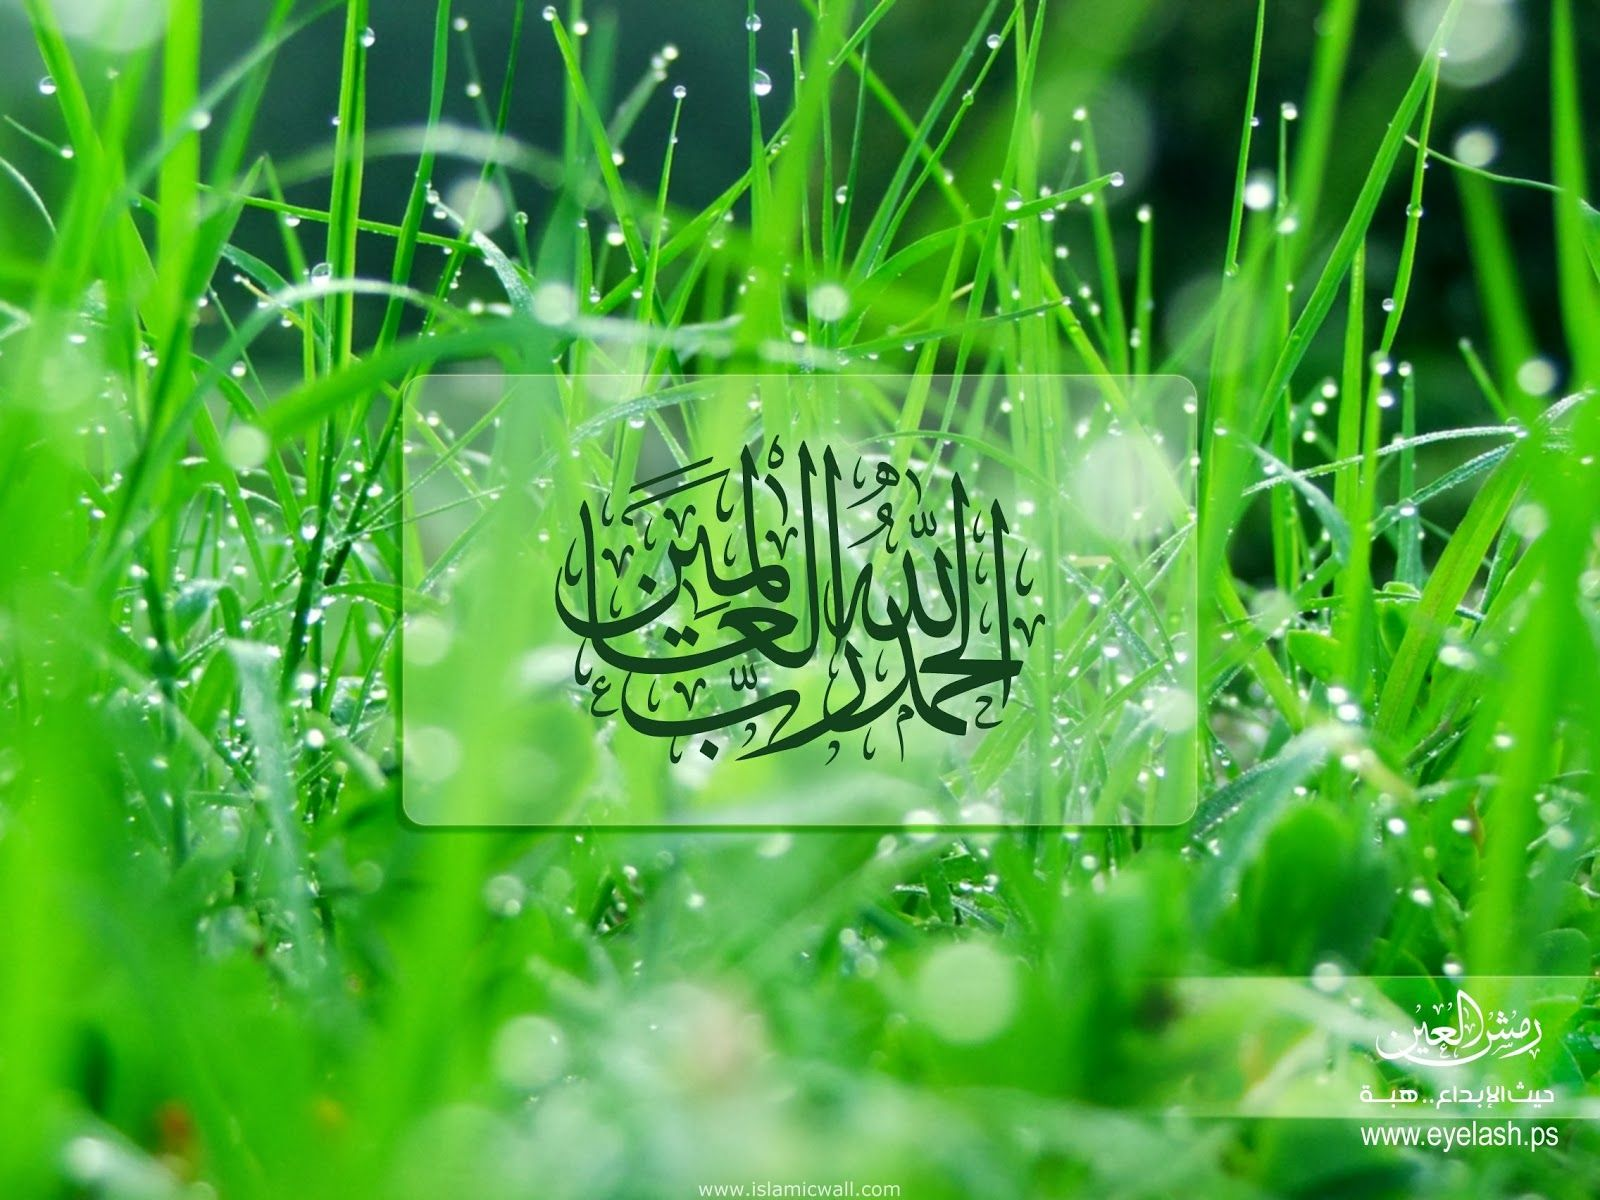 Slamic Wallpapers Hd Images Of Islamic Ultra Hd K Islamic